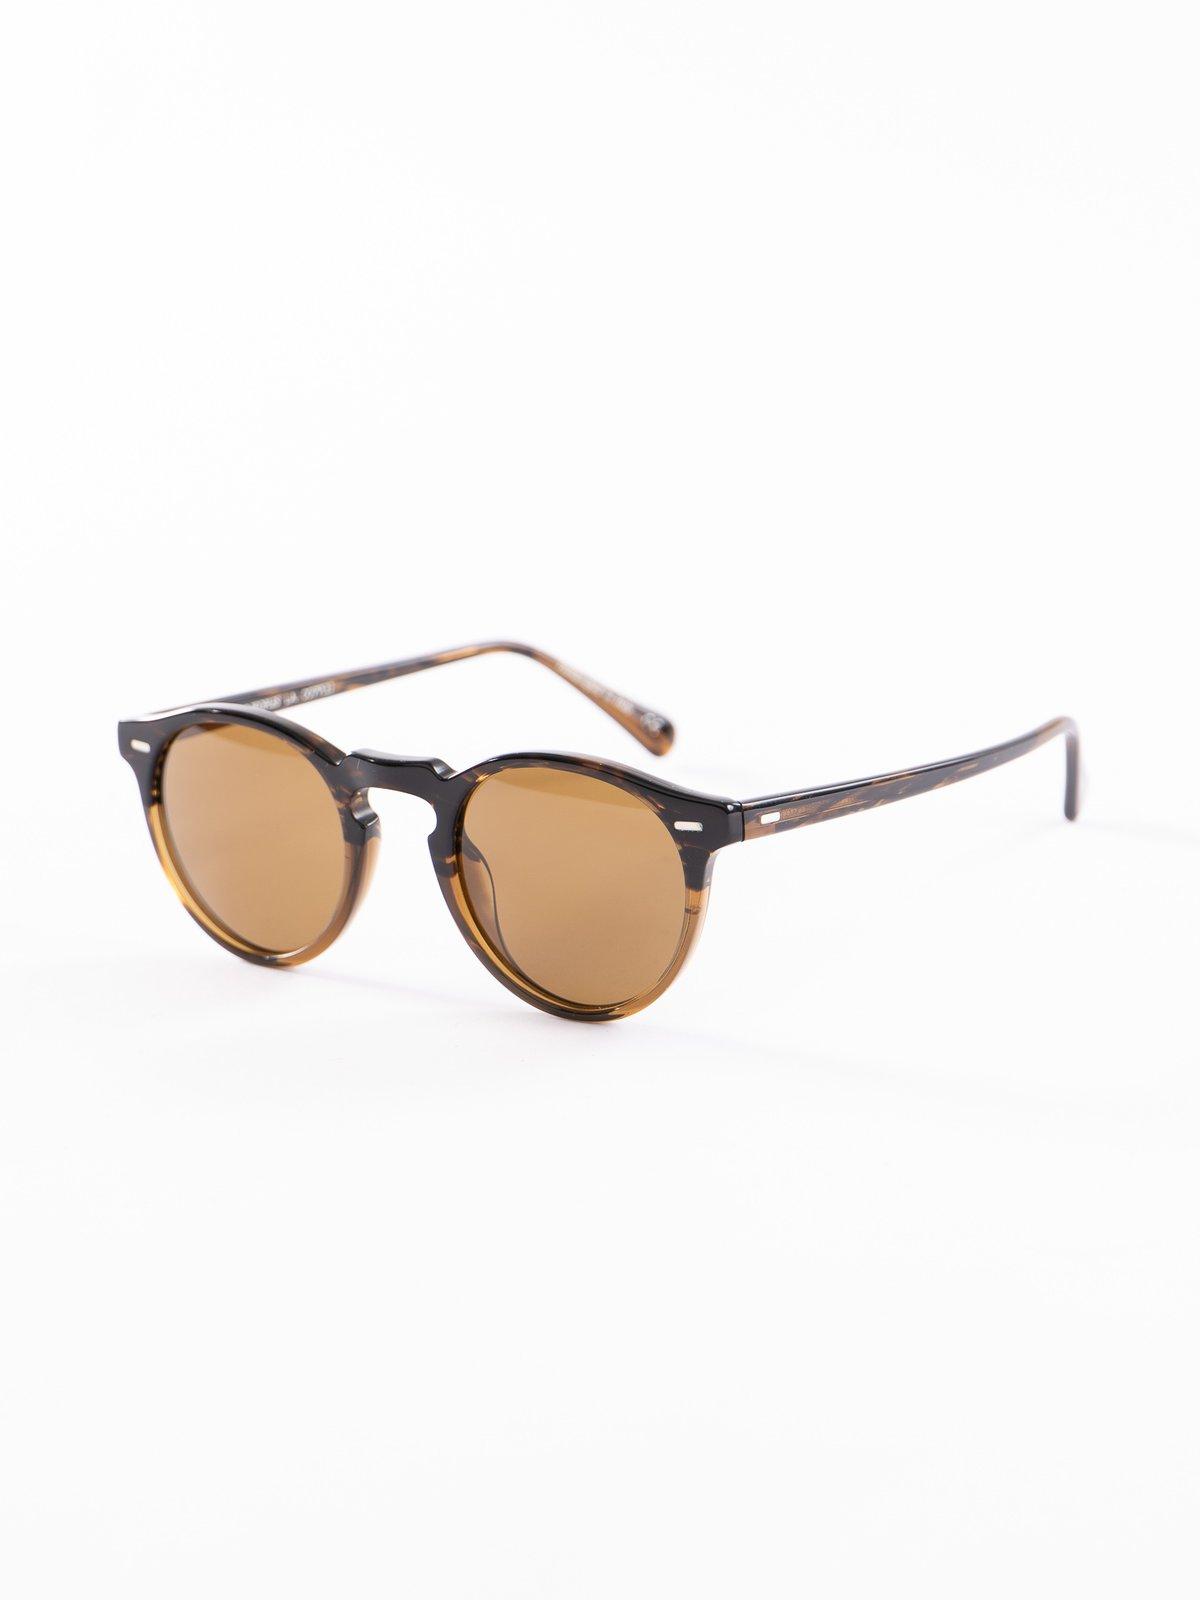 Tortoise/Brown Gregory Peck Sunglasses - Image 2